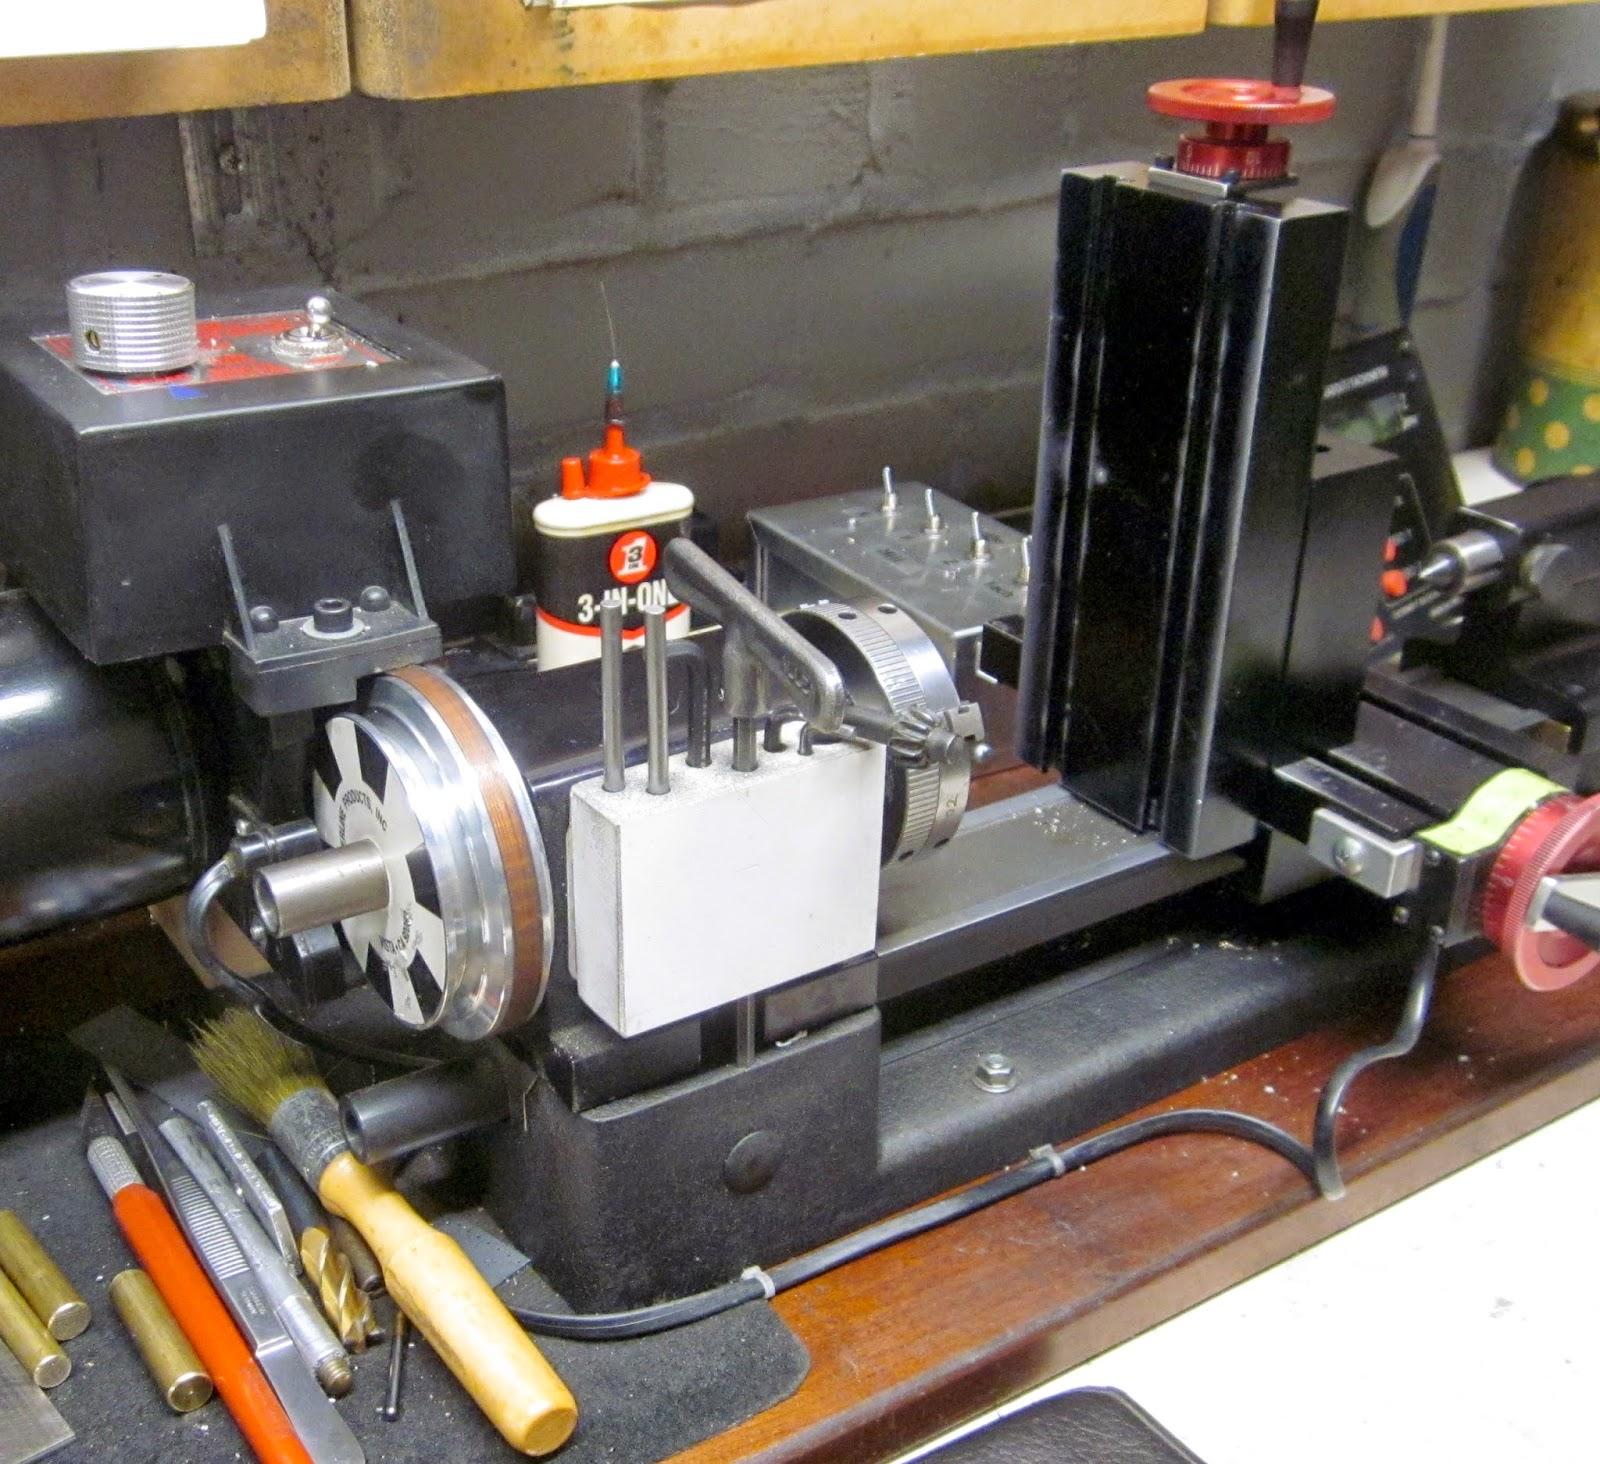 MI Shop Tools Inventions: Sherline Lathe - DIY Vertical